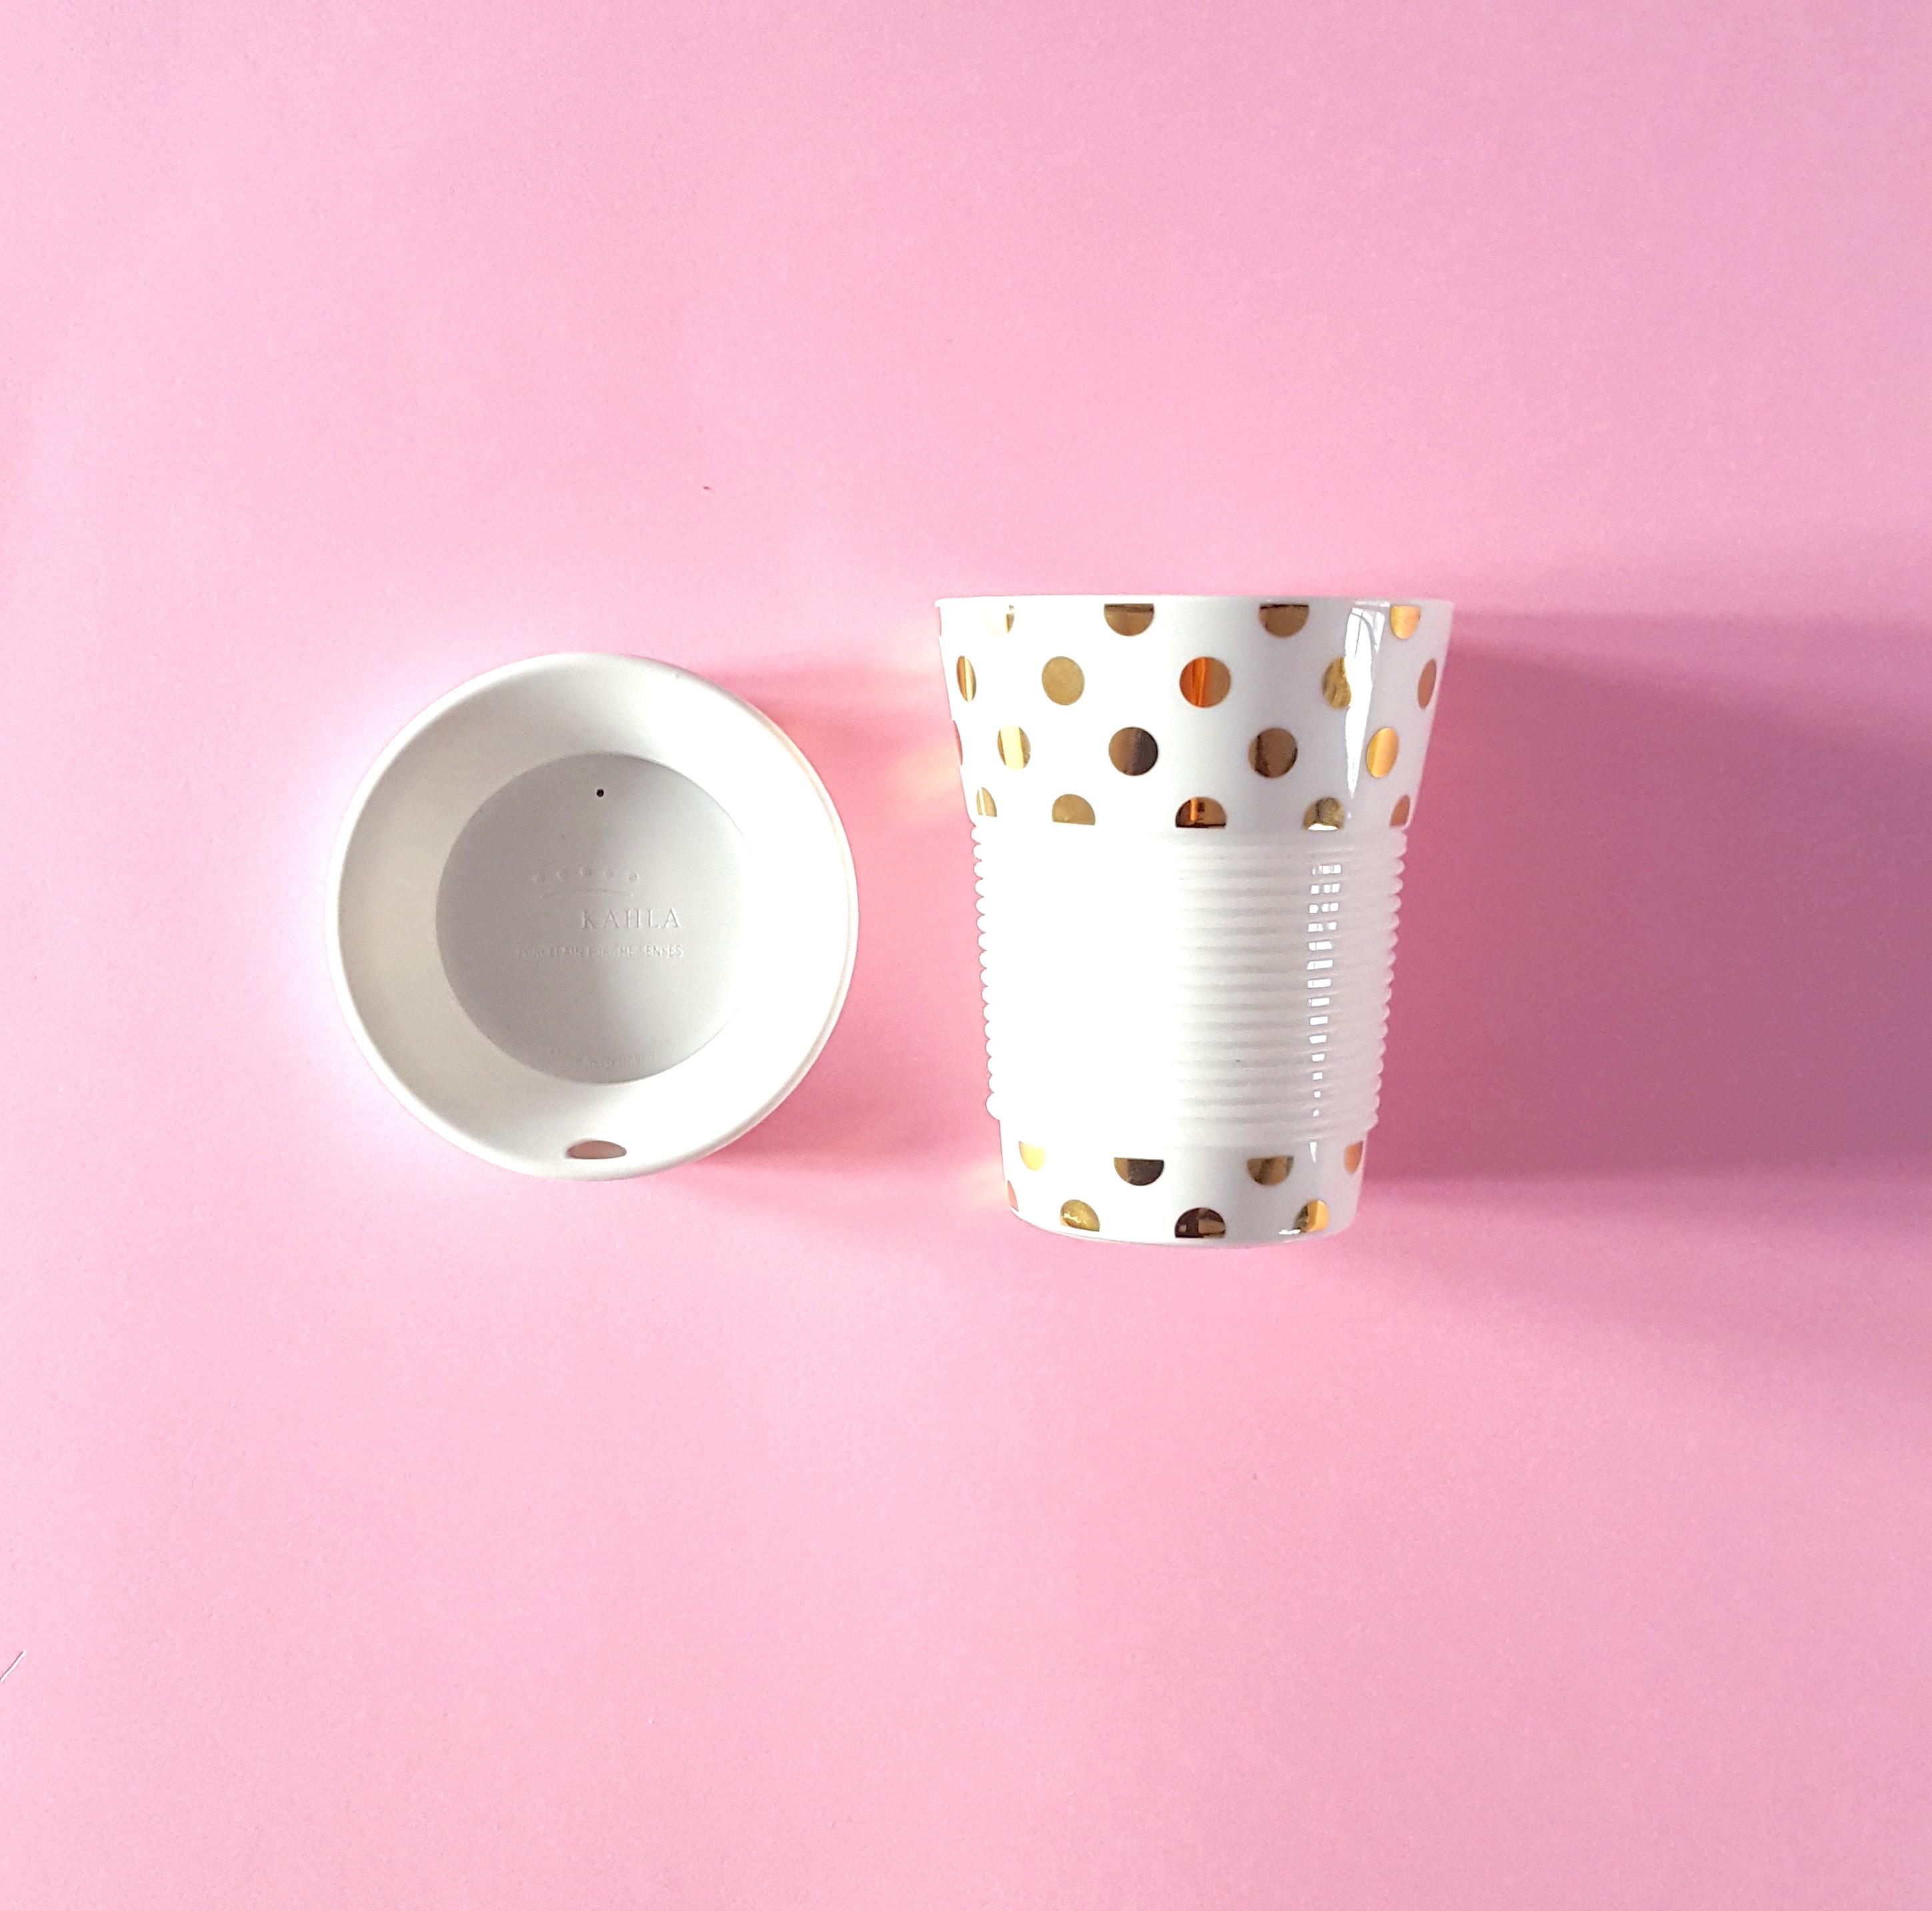 Lehrergeschenk, Lehrerkaffee, Happy Cup, Happy Teaching.Kollektion, Lehrershop, Lehrertasse